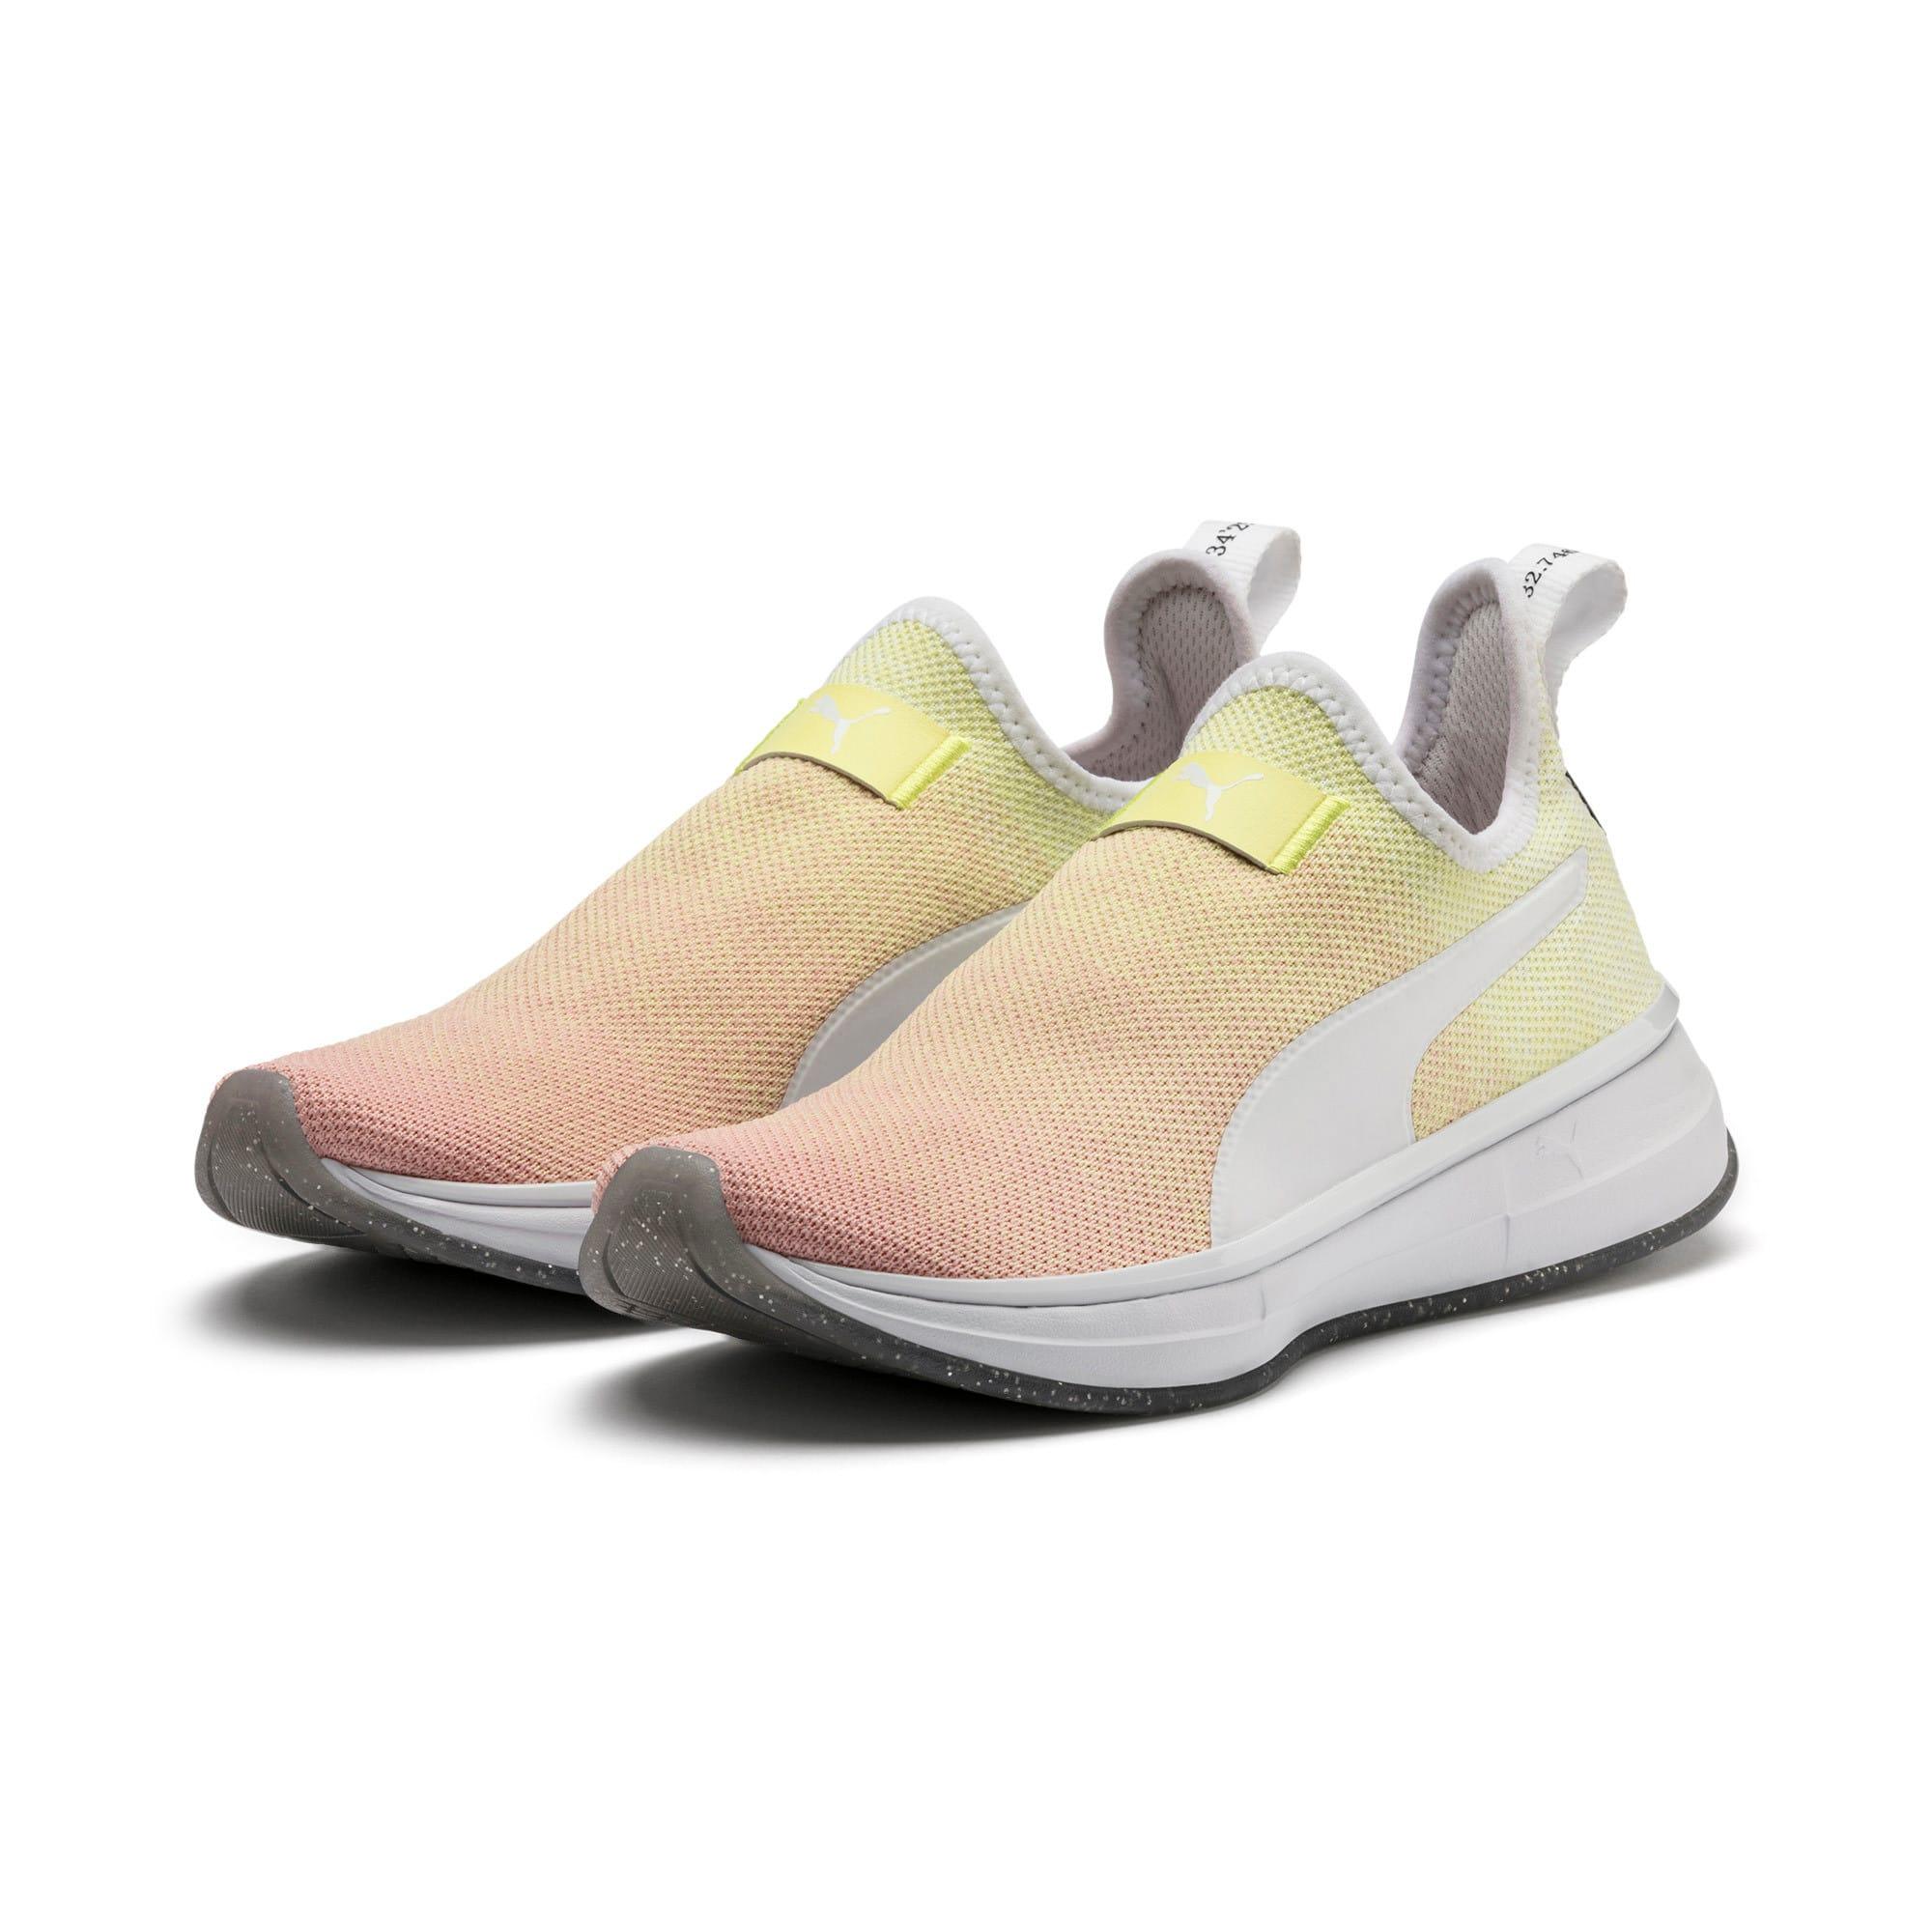 Thumbnail 3 of PUMA x SELENA GOMEZ Slip-On Gradient Women's Training Shoes, YELLOW-Peach Bud-White, medium